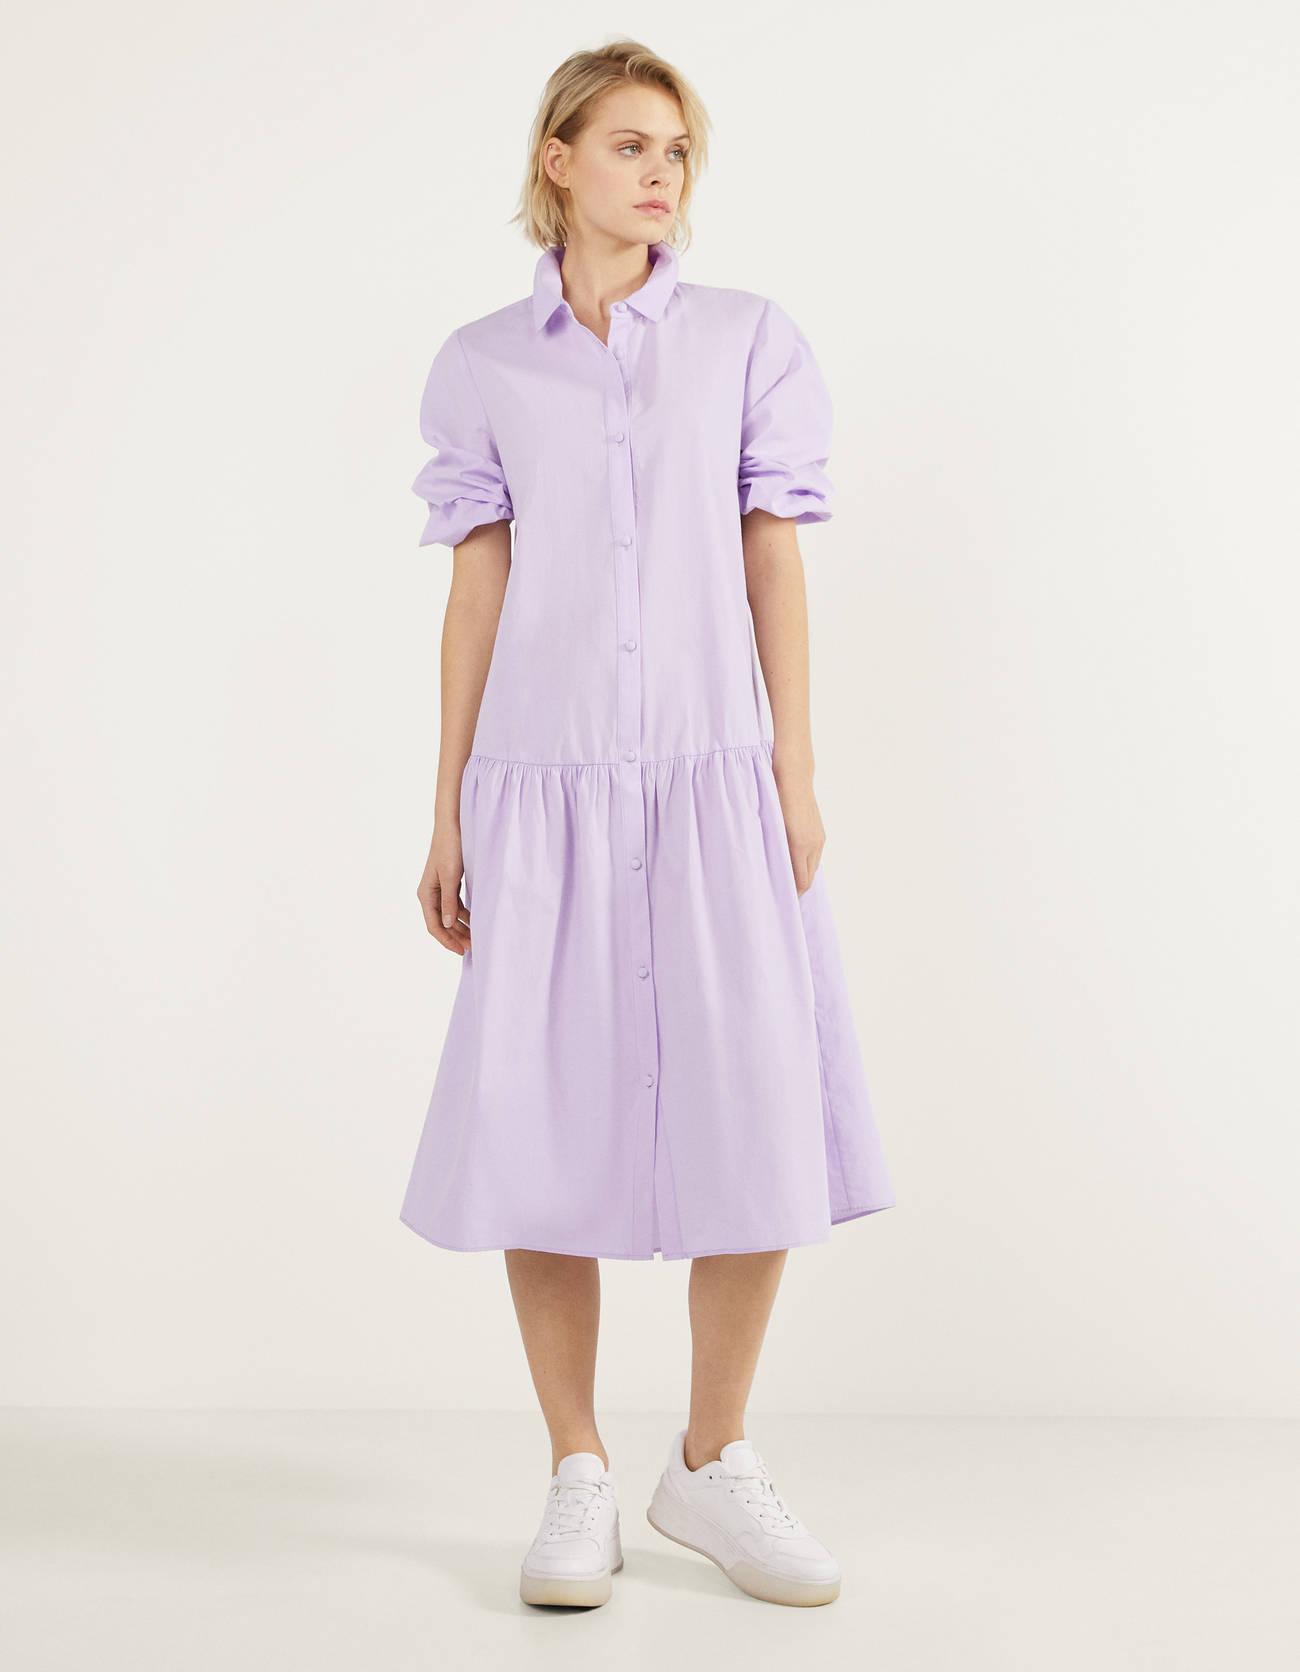 Vestido camisero de popelín en lila